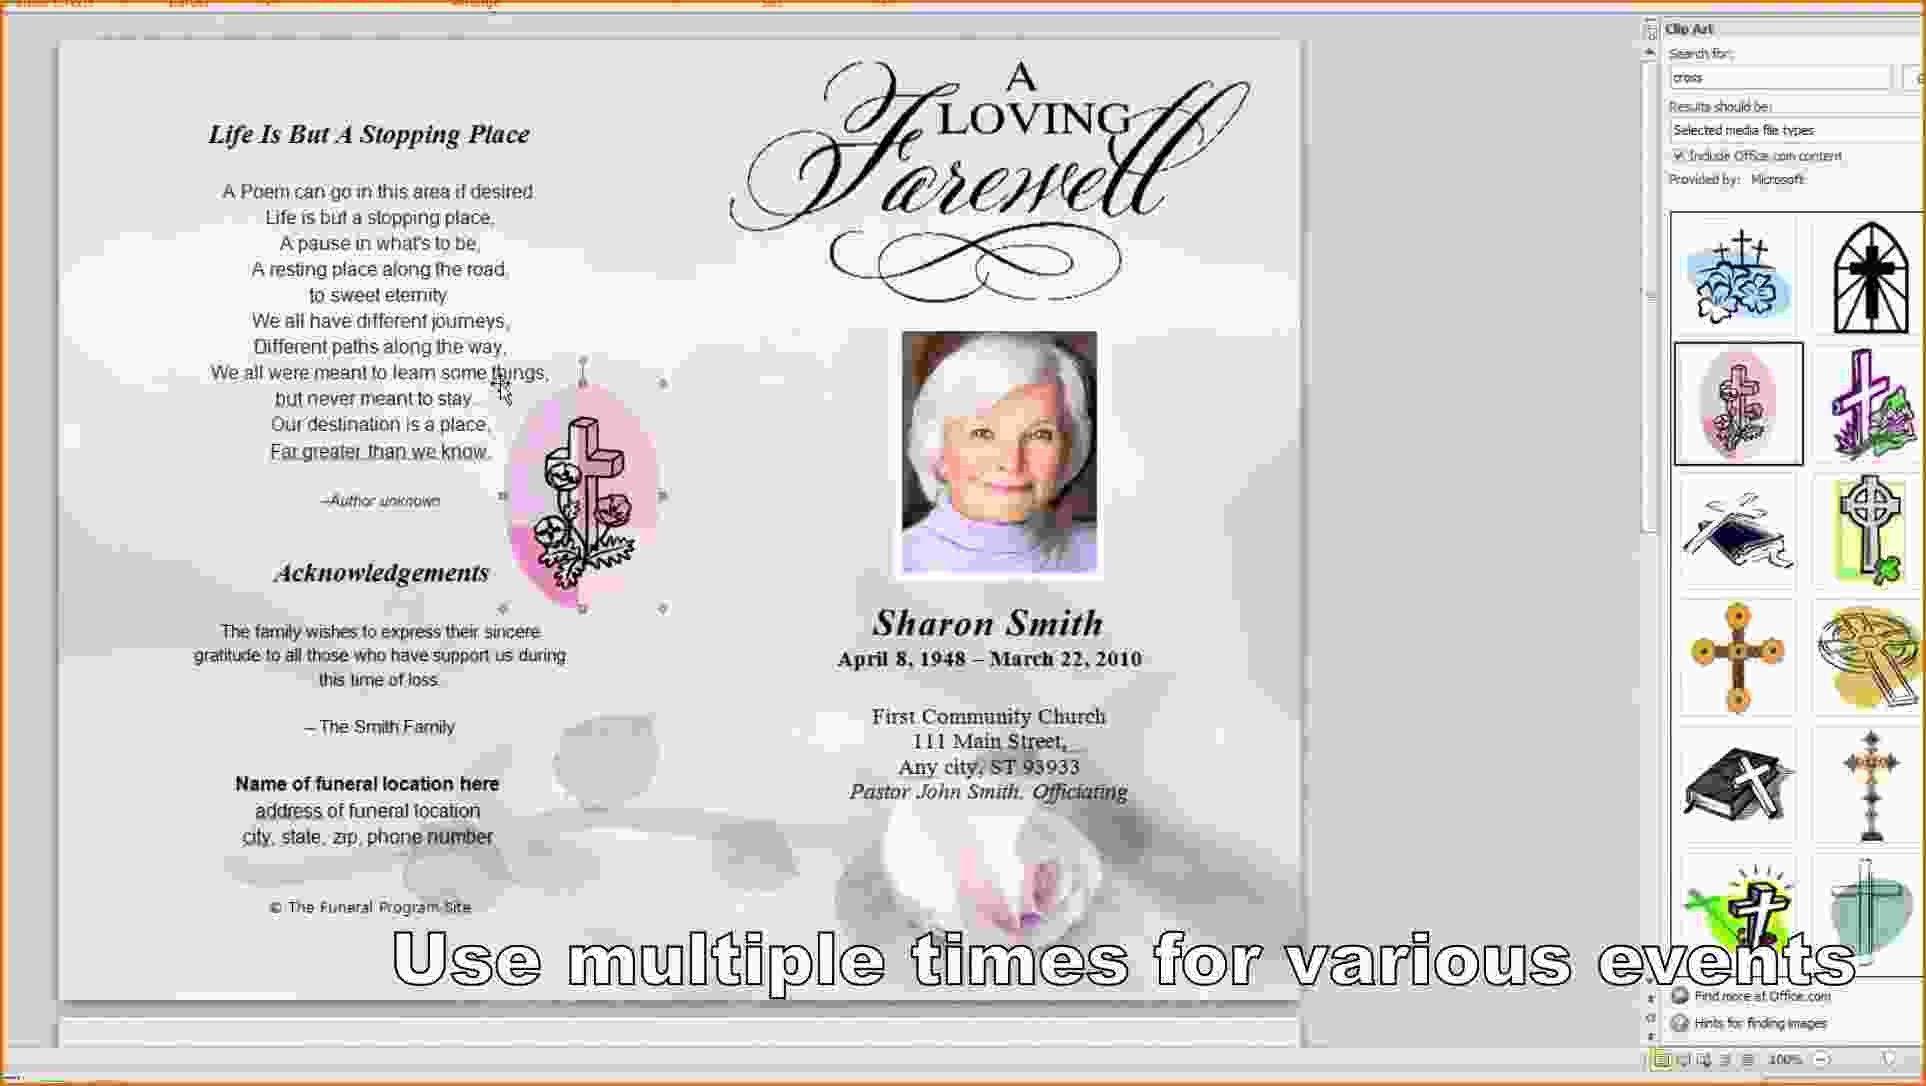 001 Top Memorial Card Template Free Download Concept Full